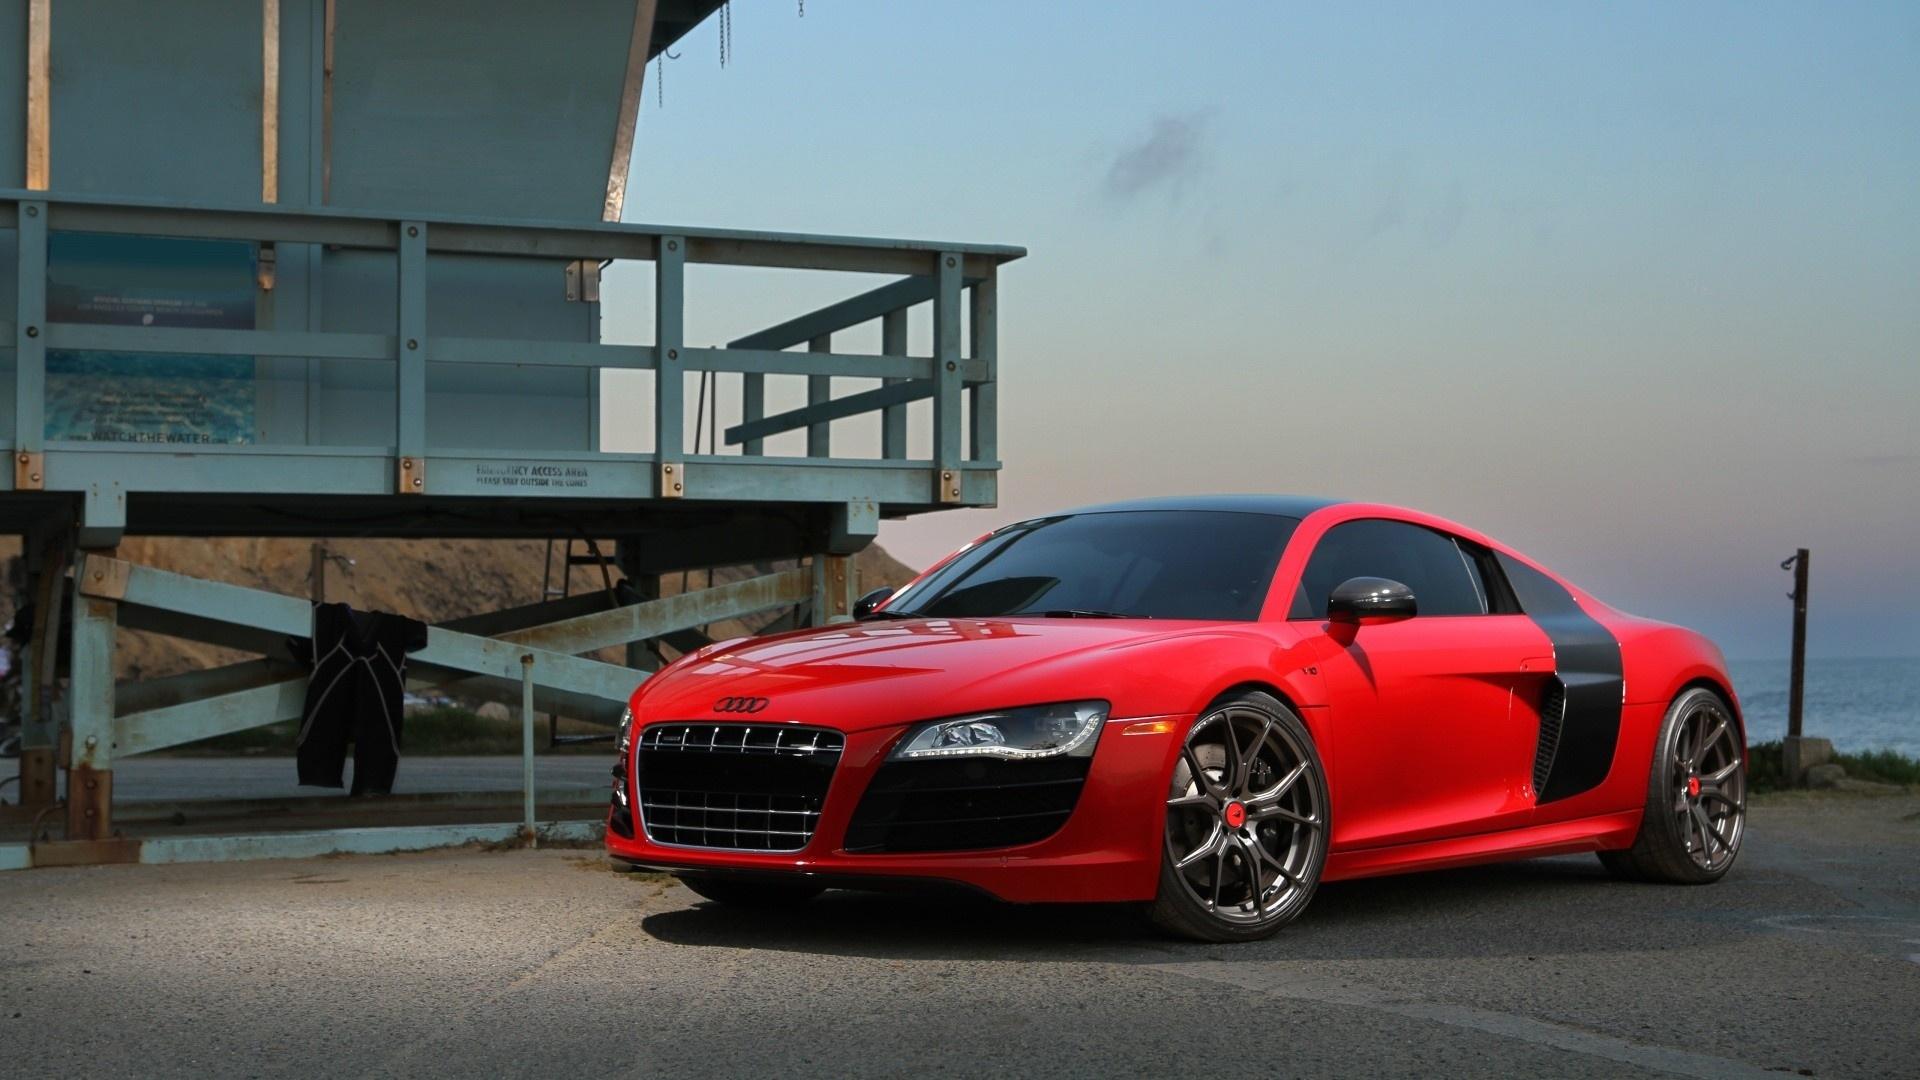 Audi R8 free picture